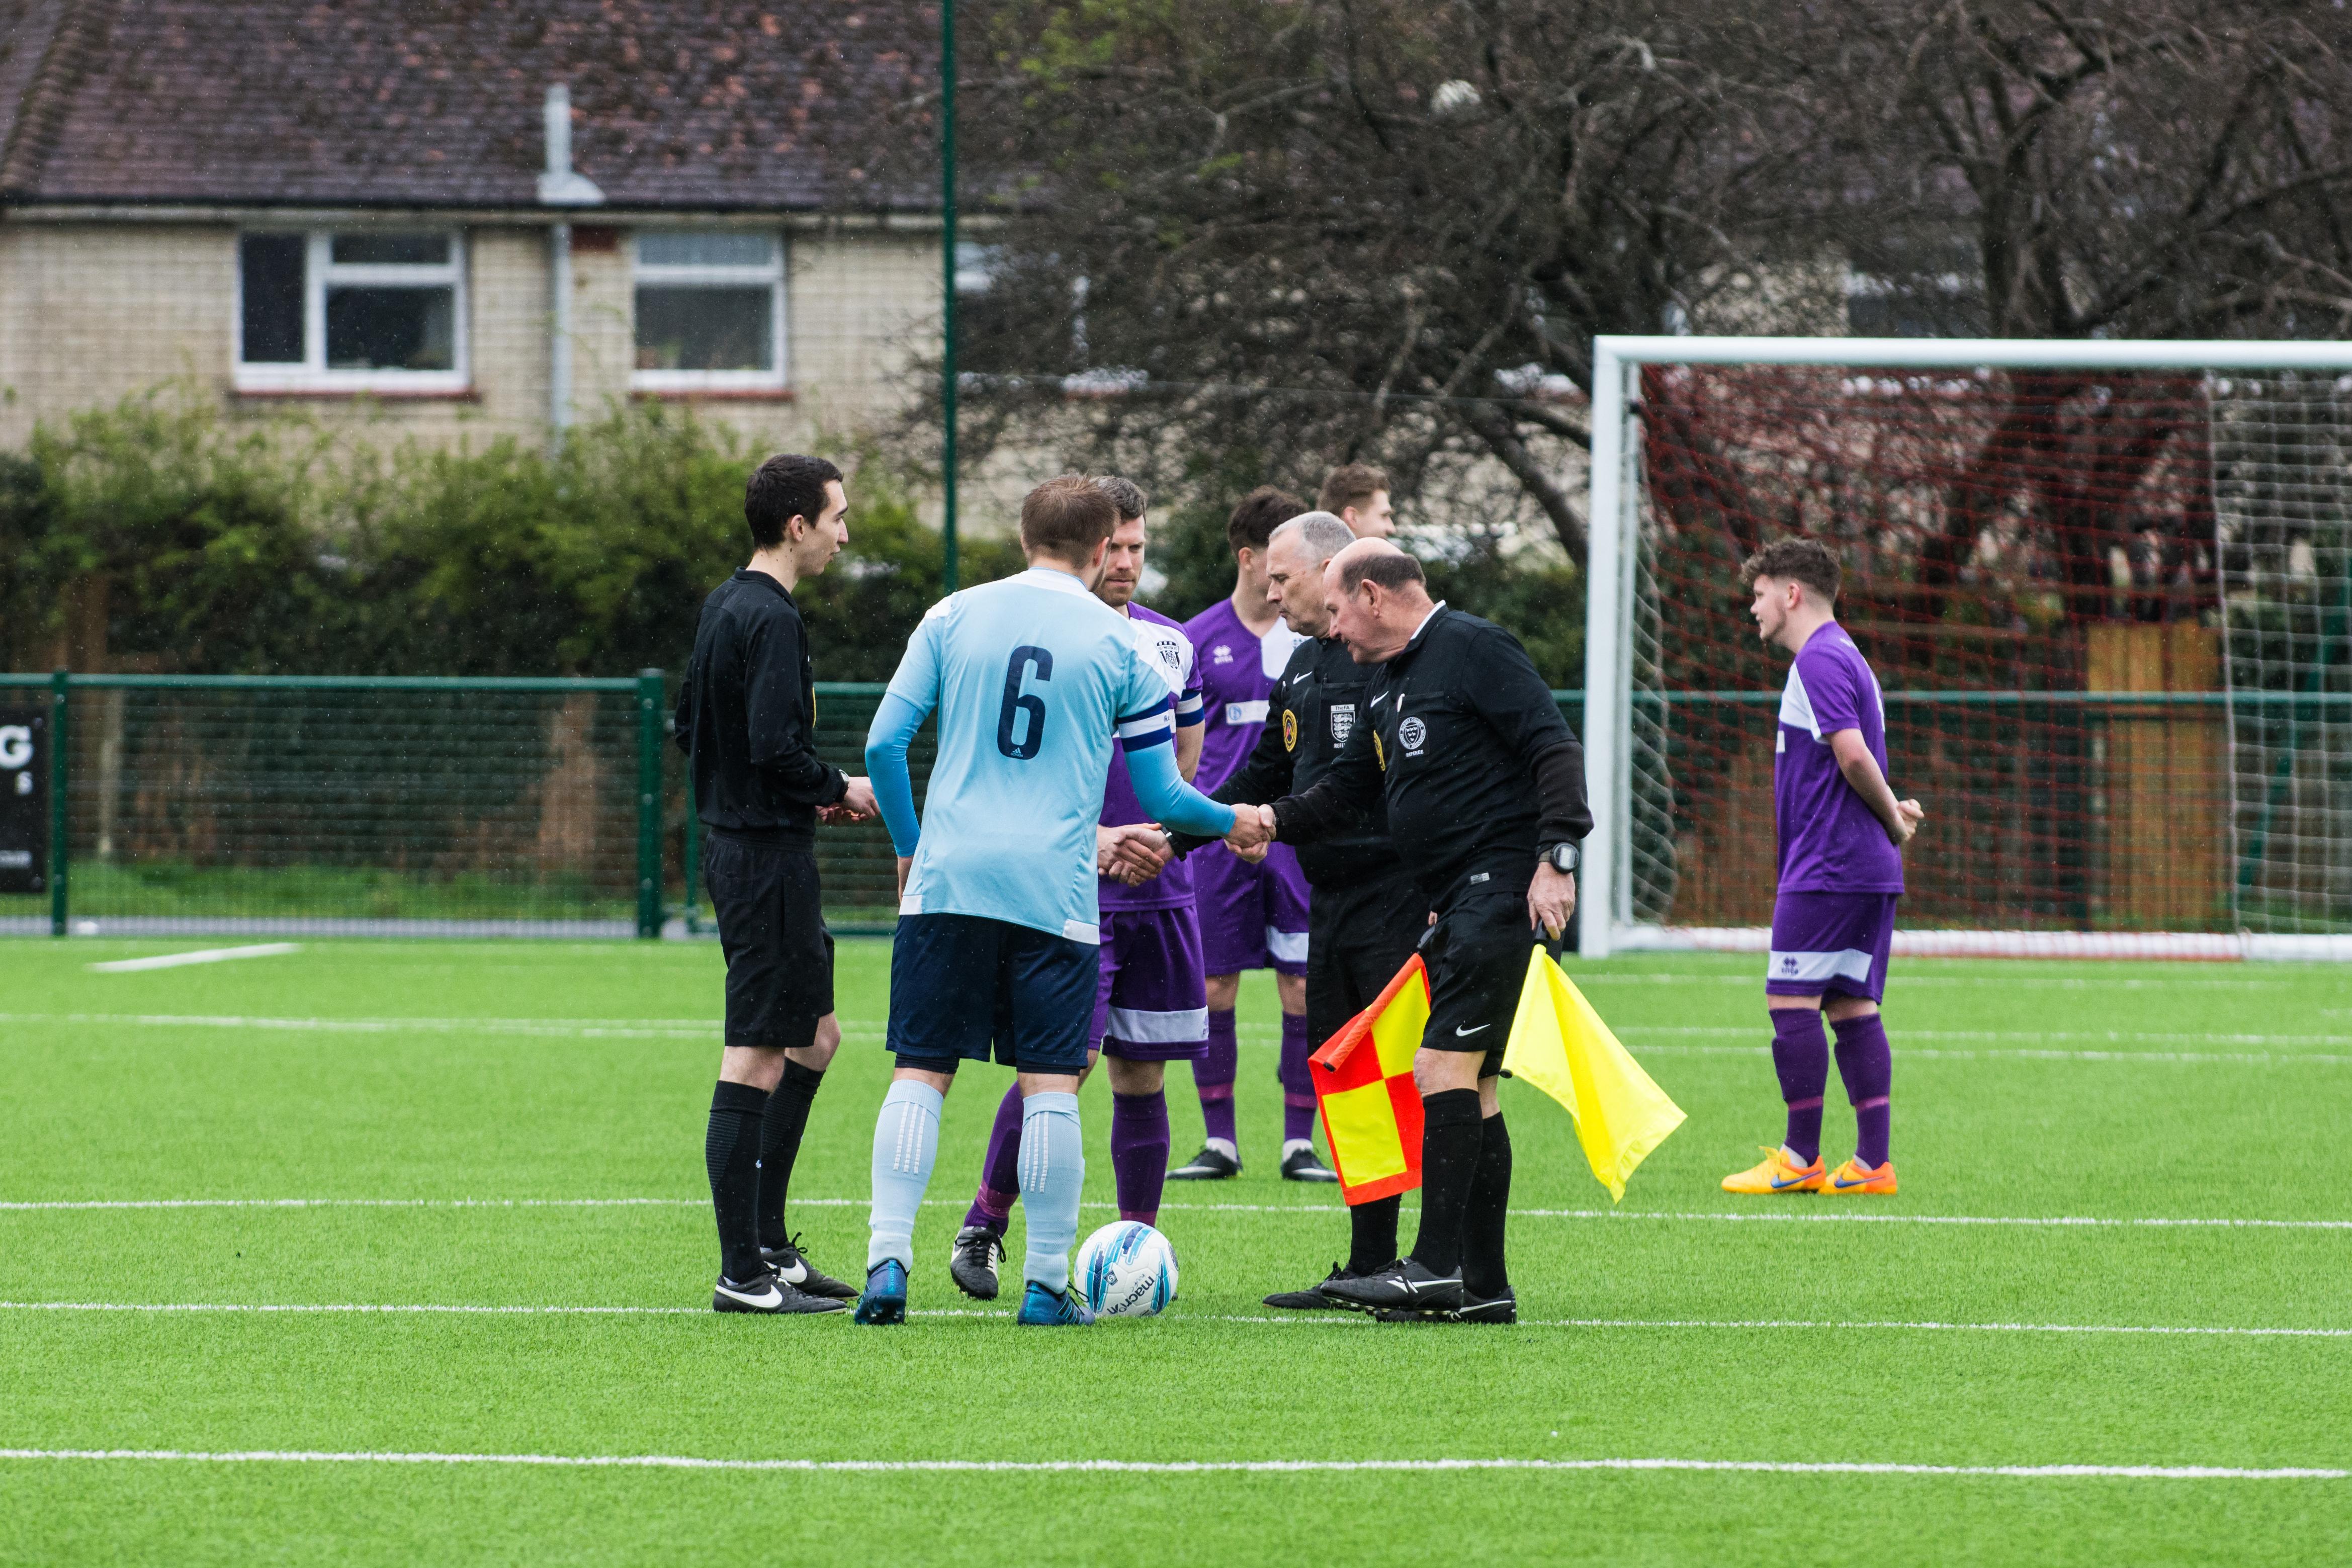 DAVID_JEFFERY Worthing United FC vs East Preston FC 02.04.18 11